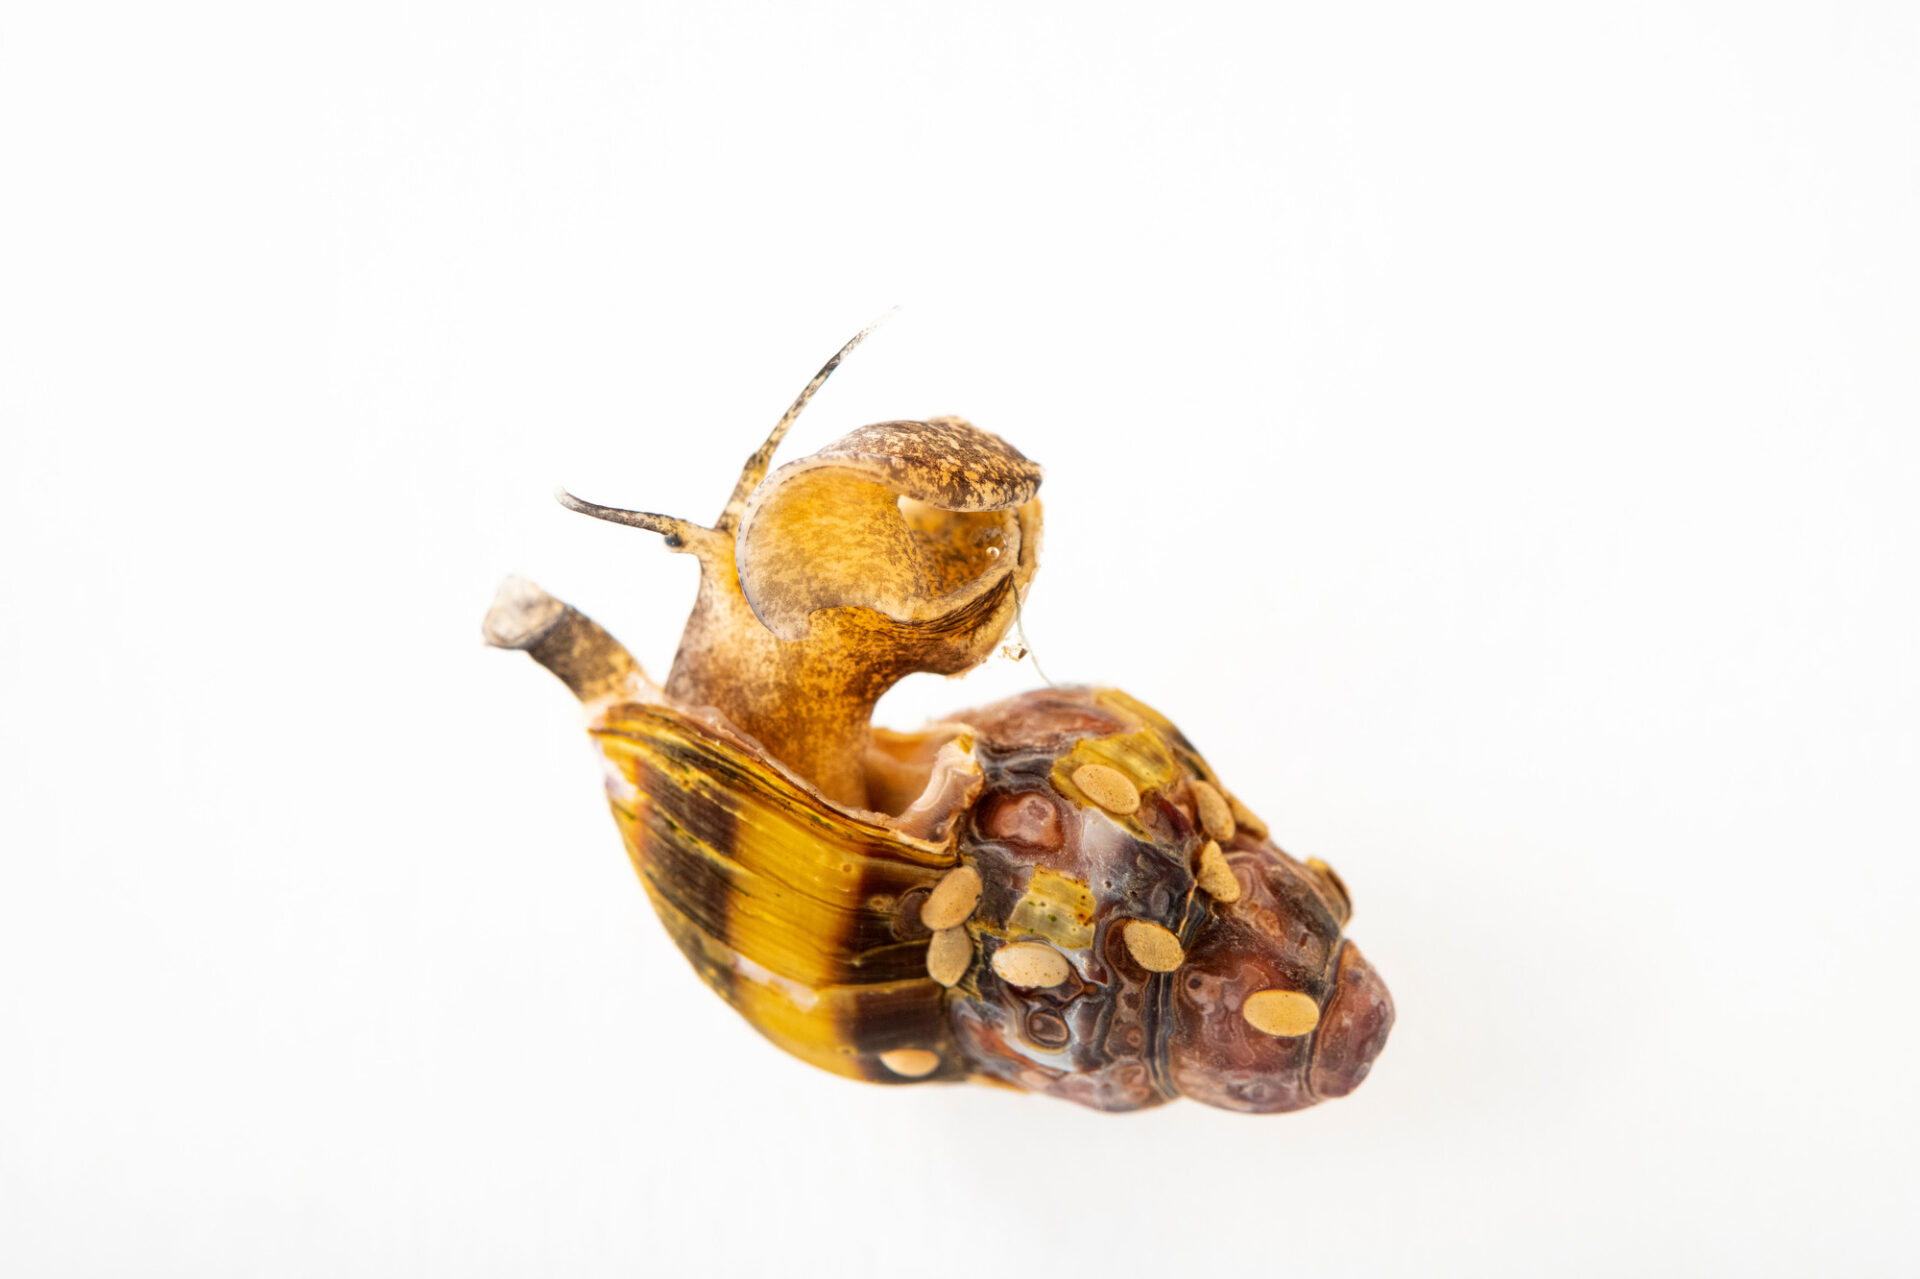 Photo: An assassin snail (Clea helena) at Safari Park Dvur Kralove.